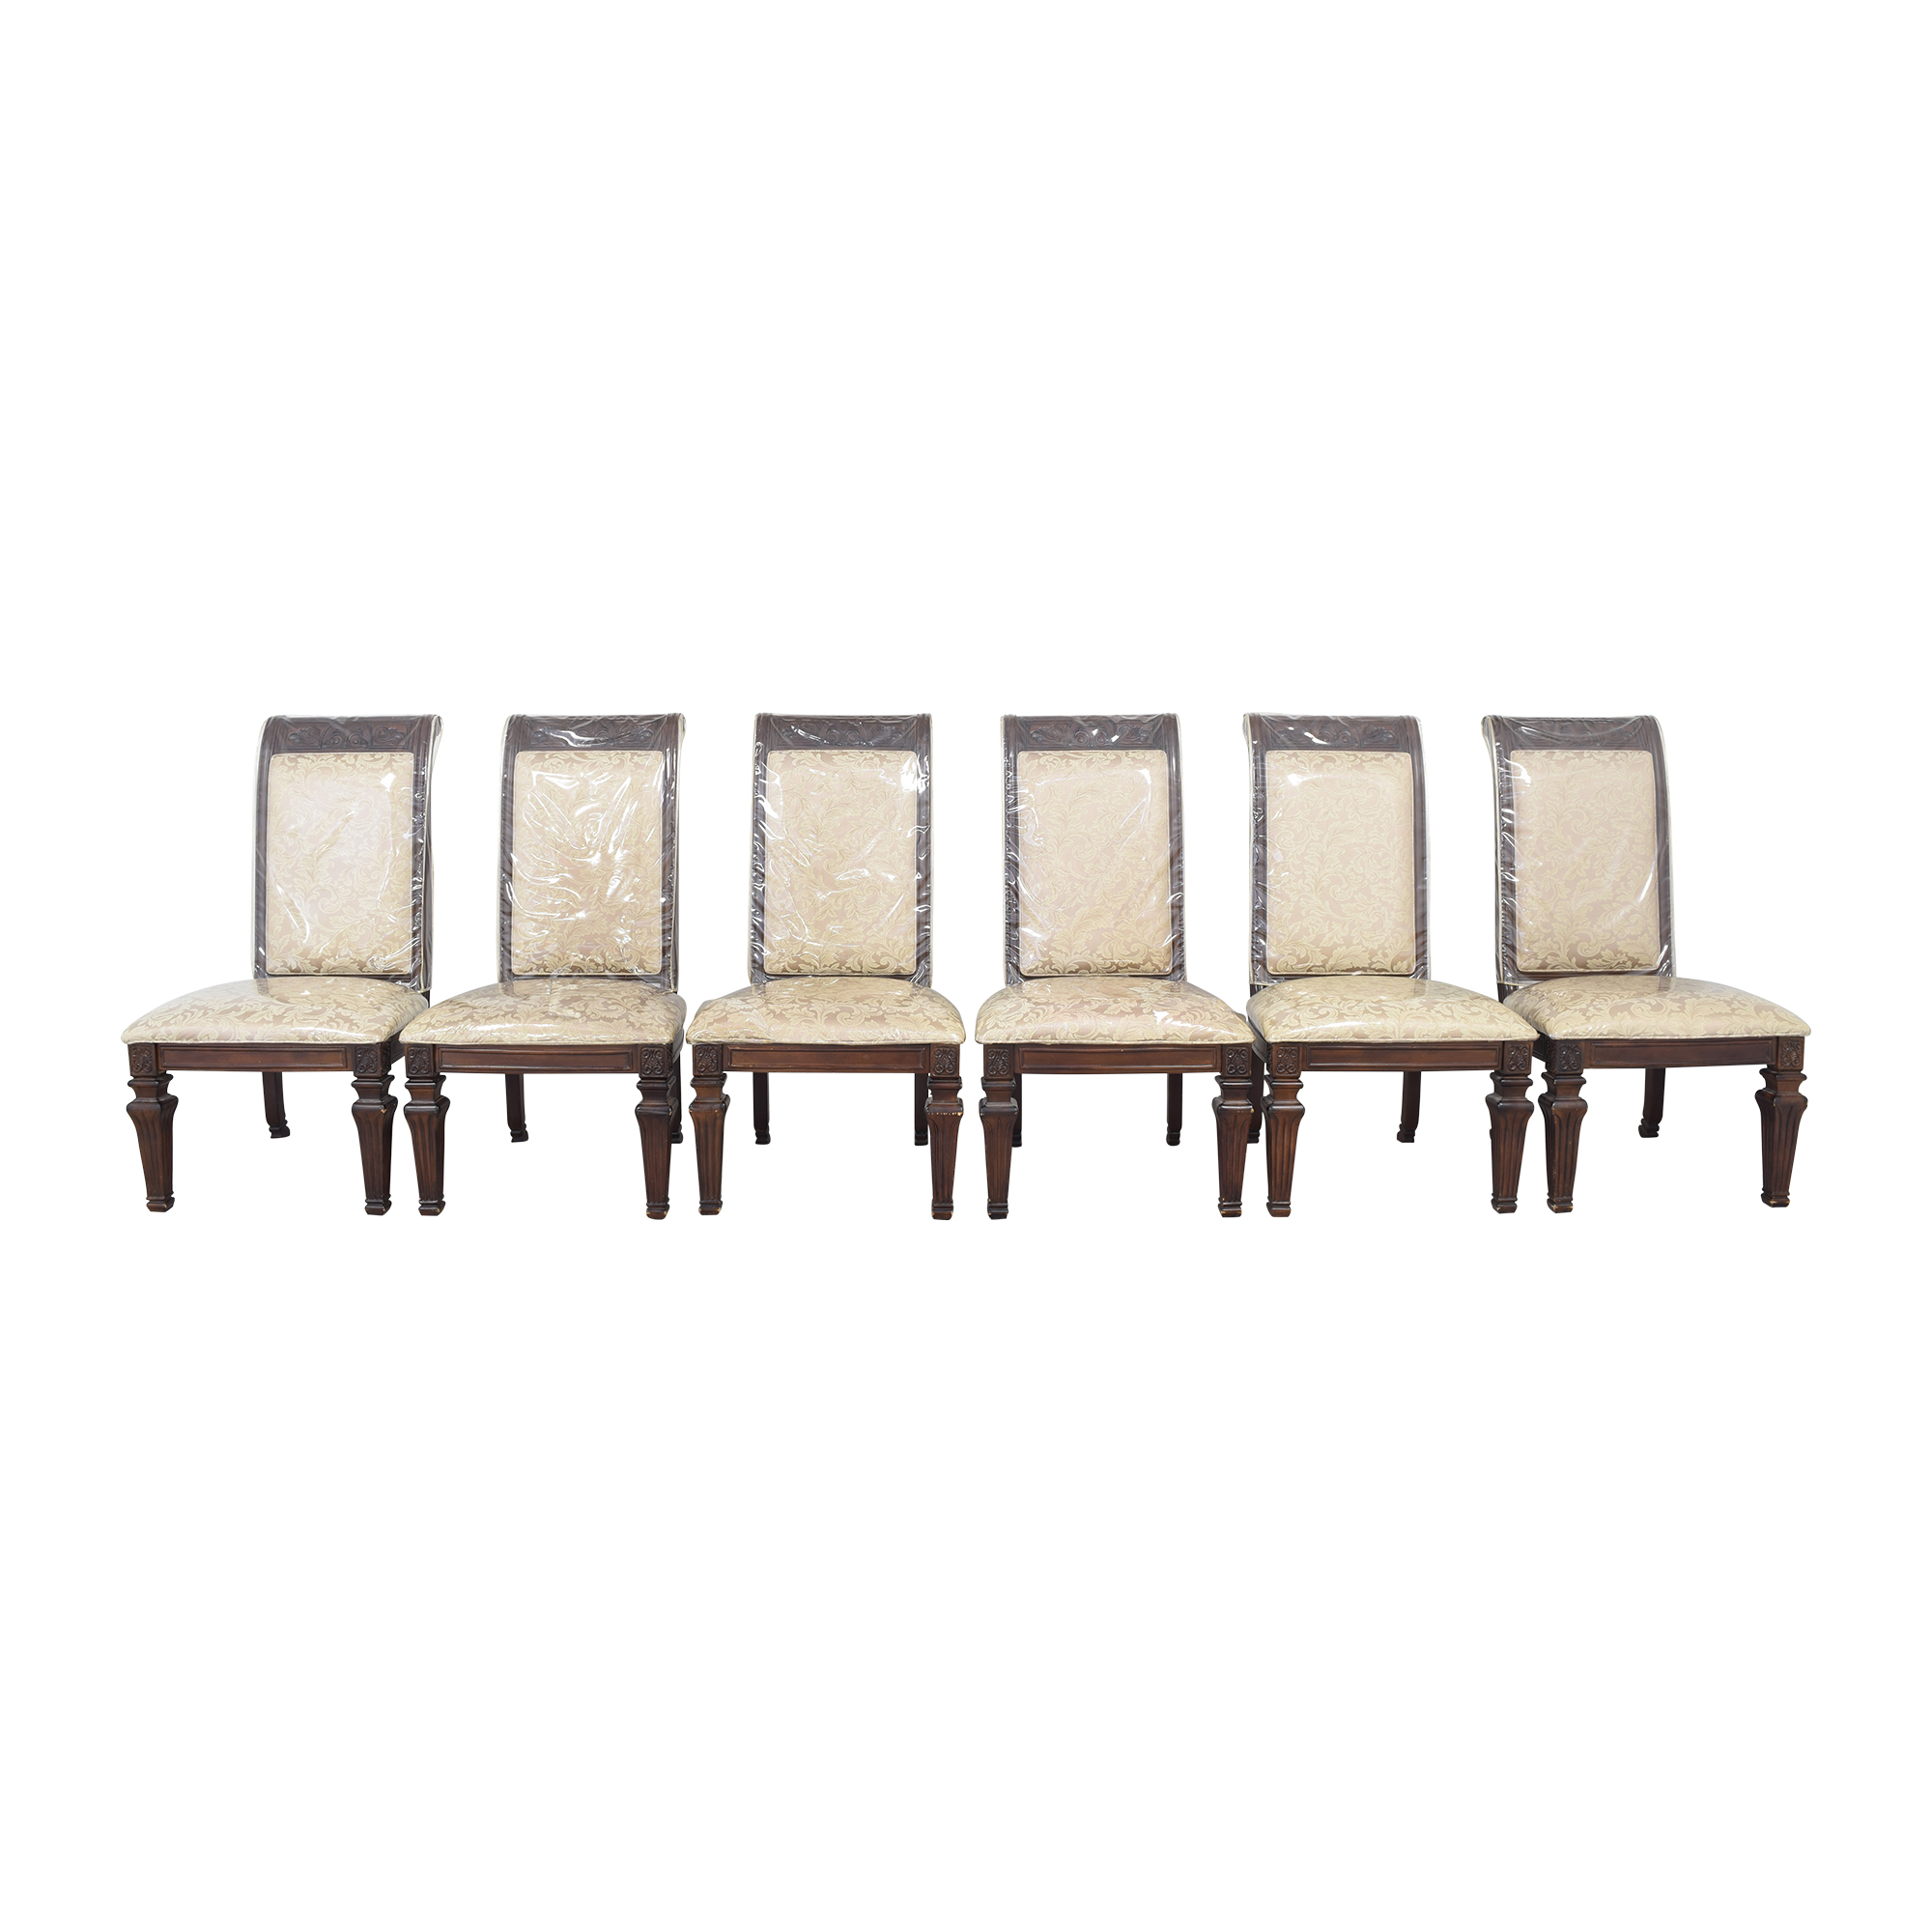 buy Micheal Amini Dining Chairs Michael Amini